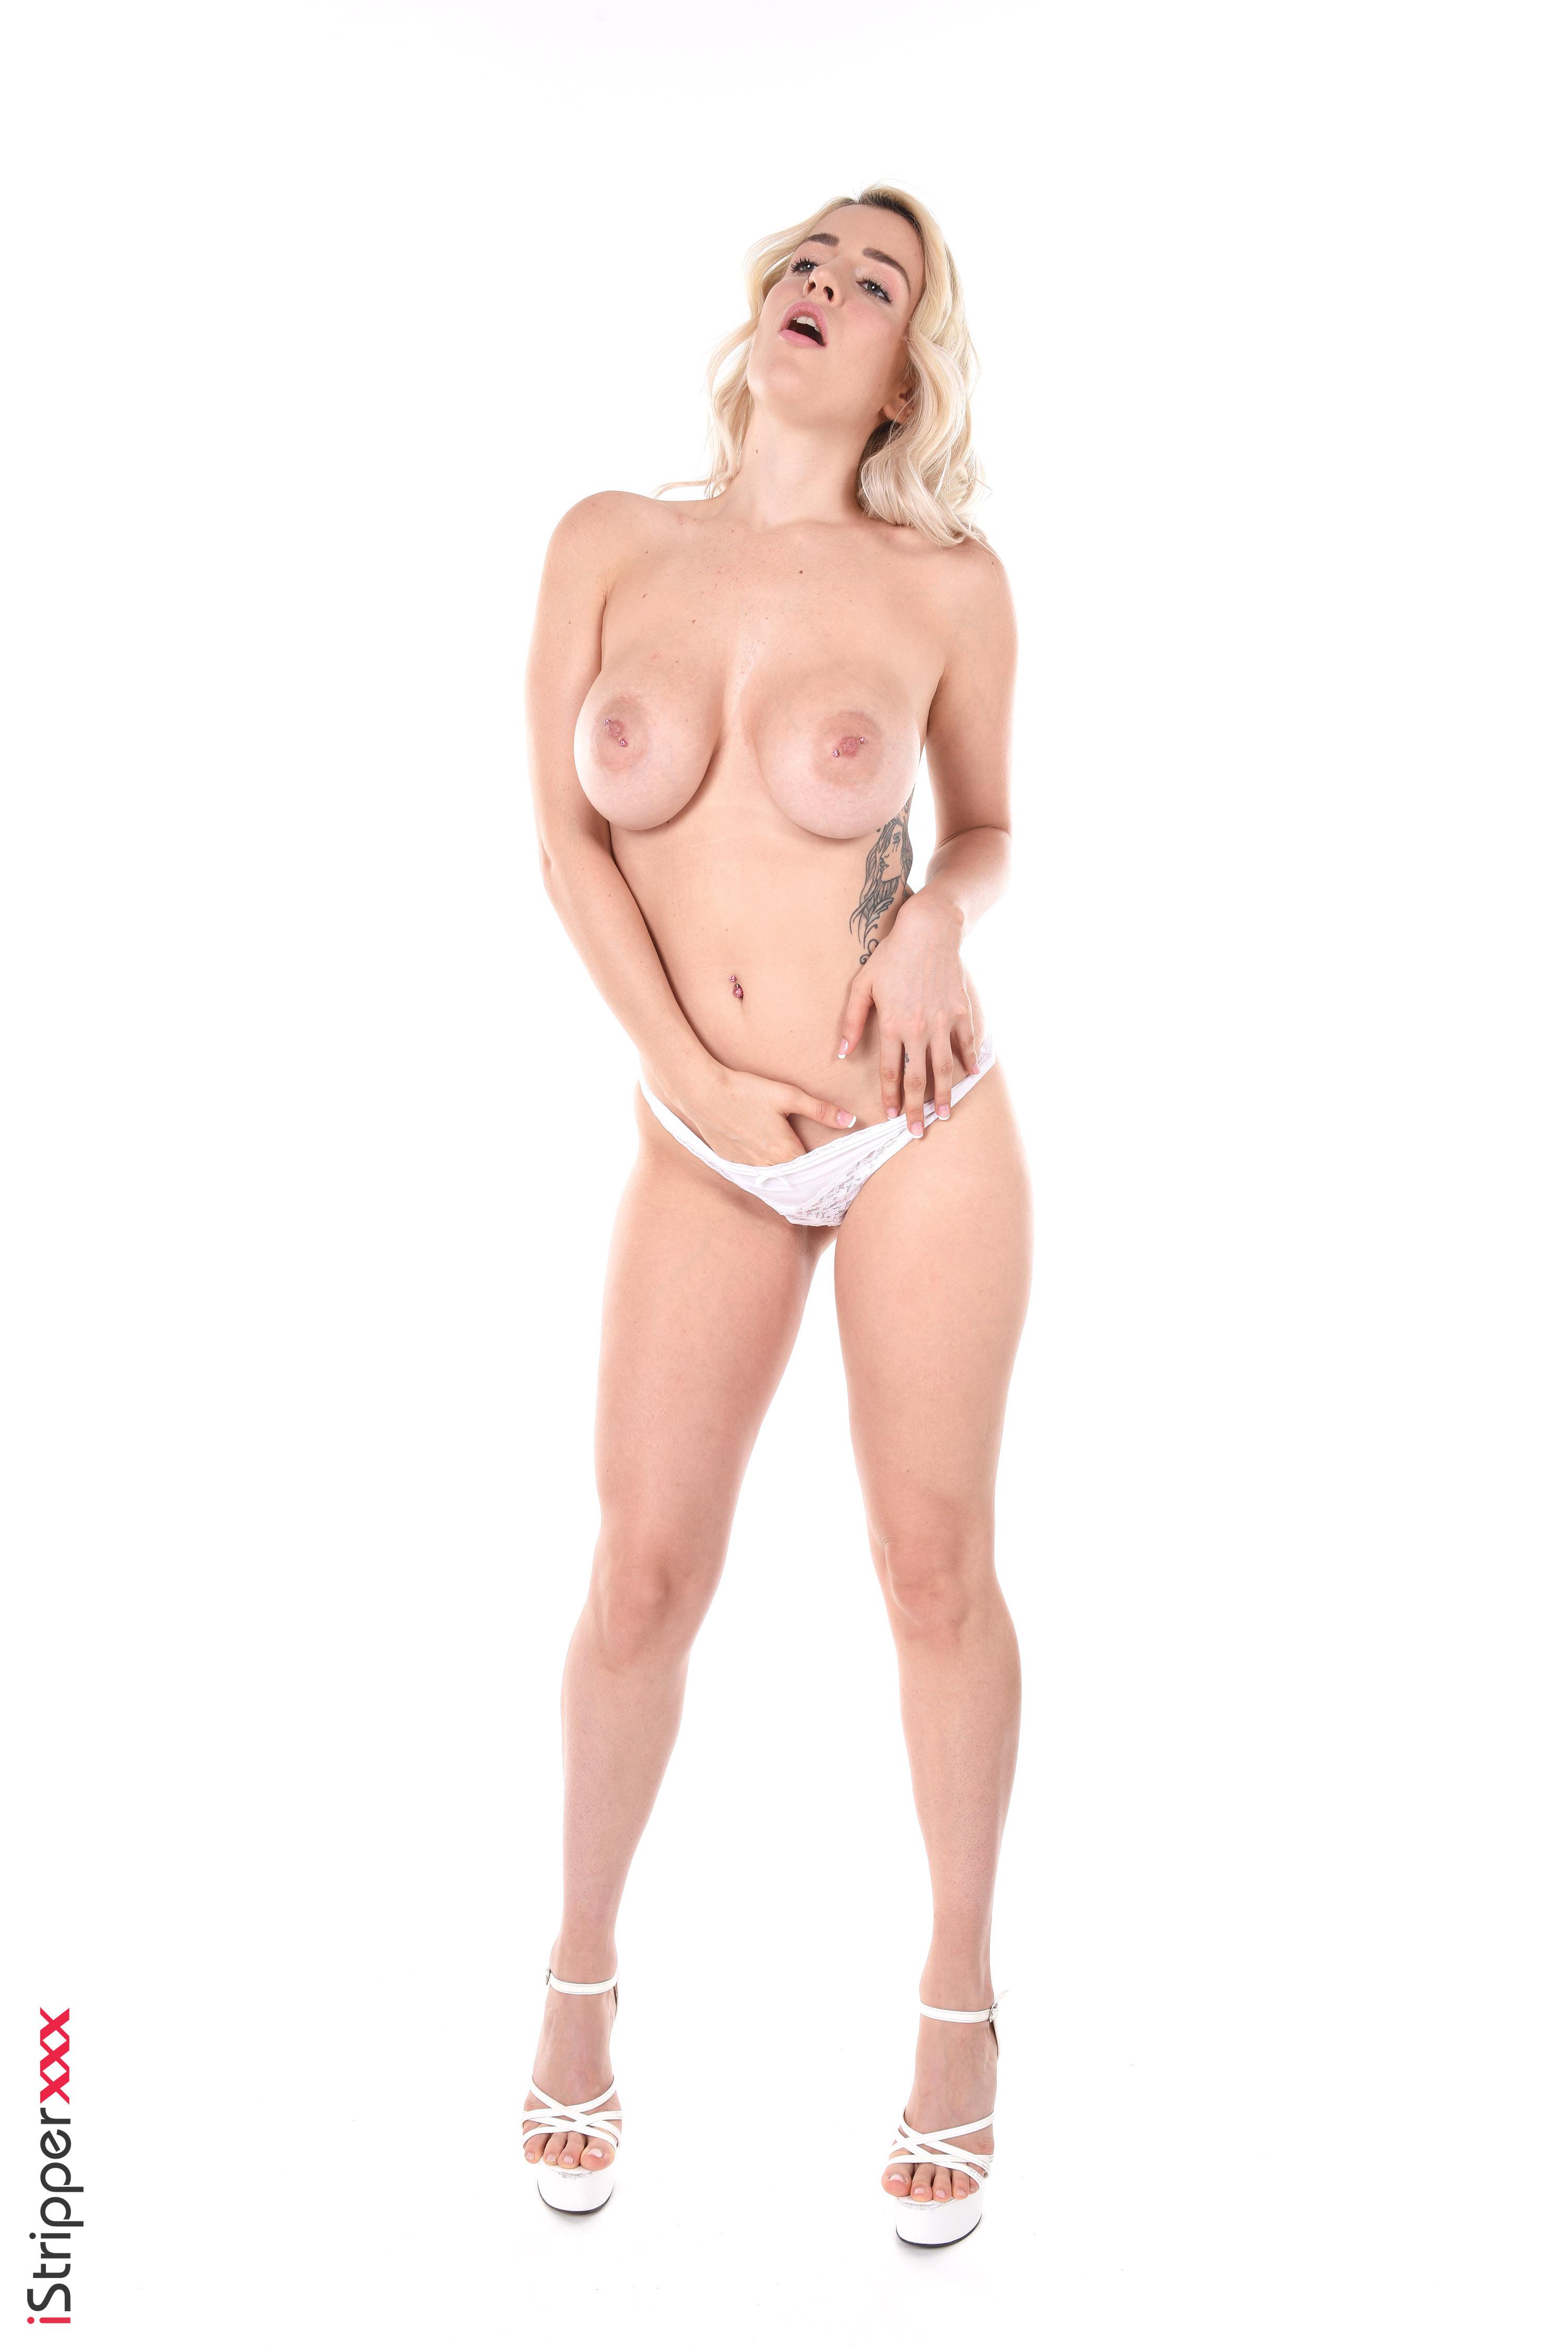 vagina pics shaved